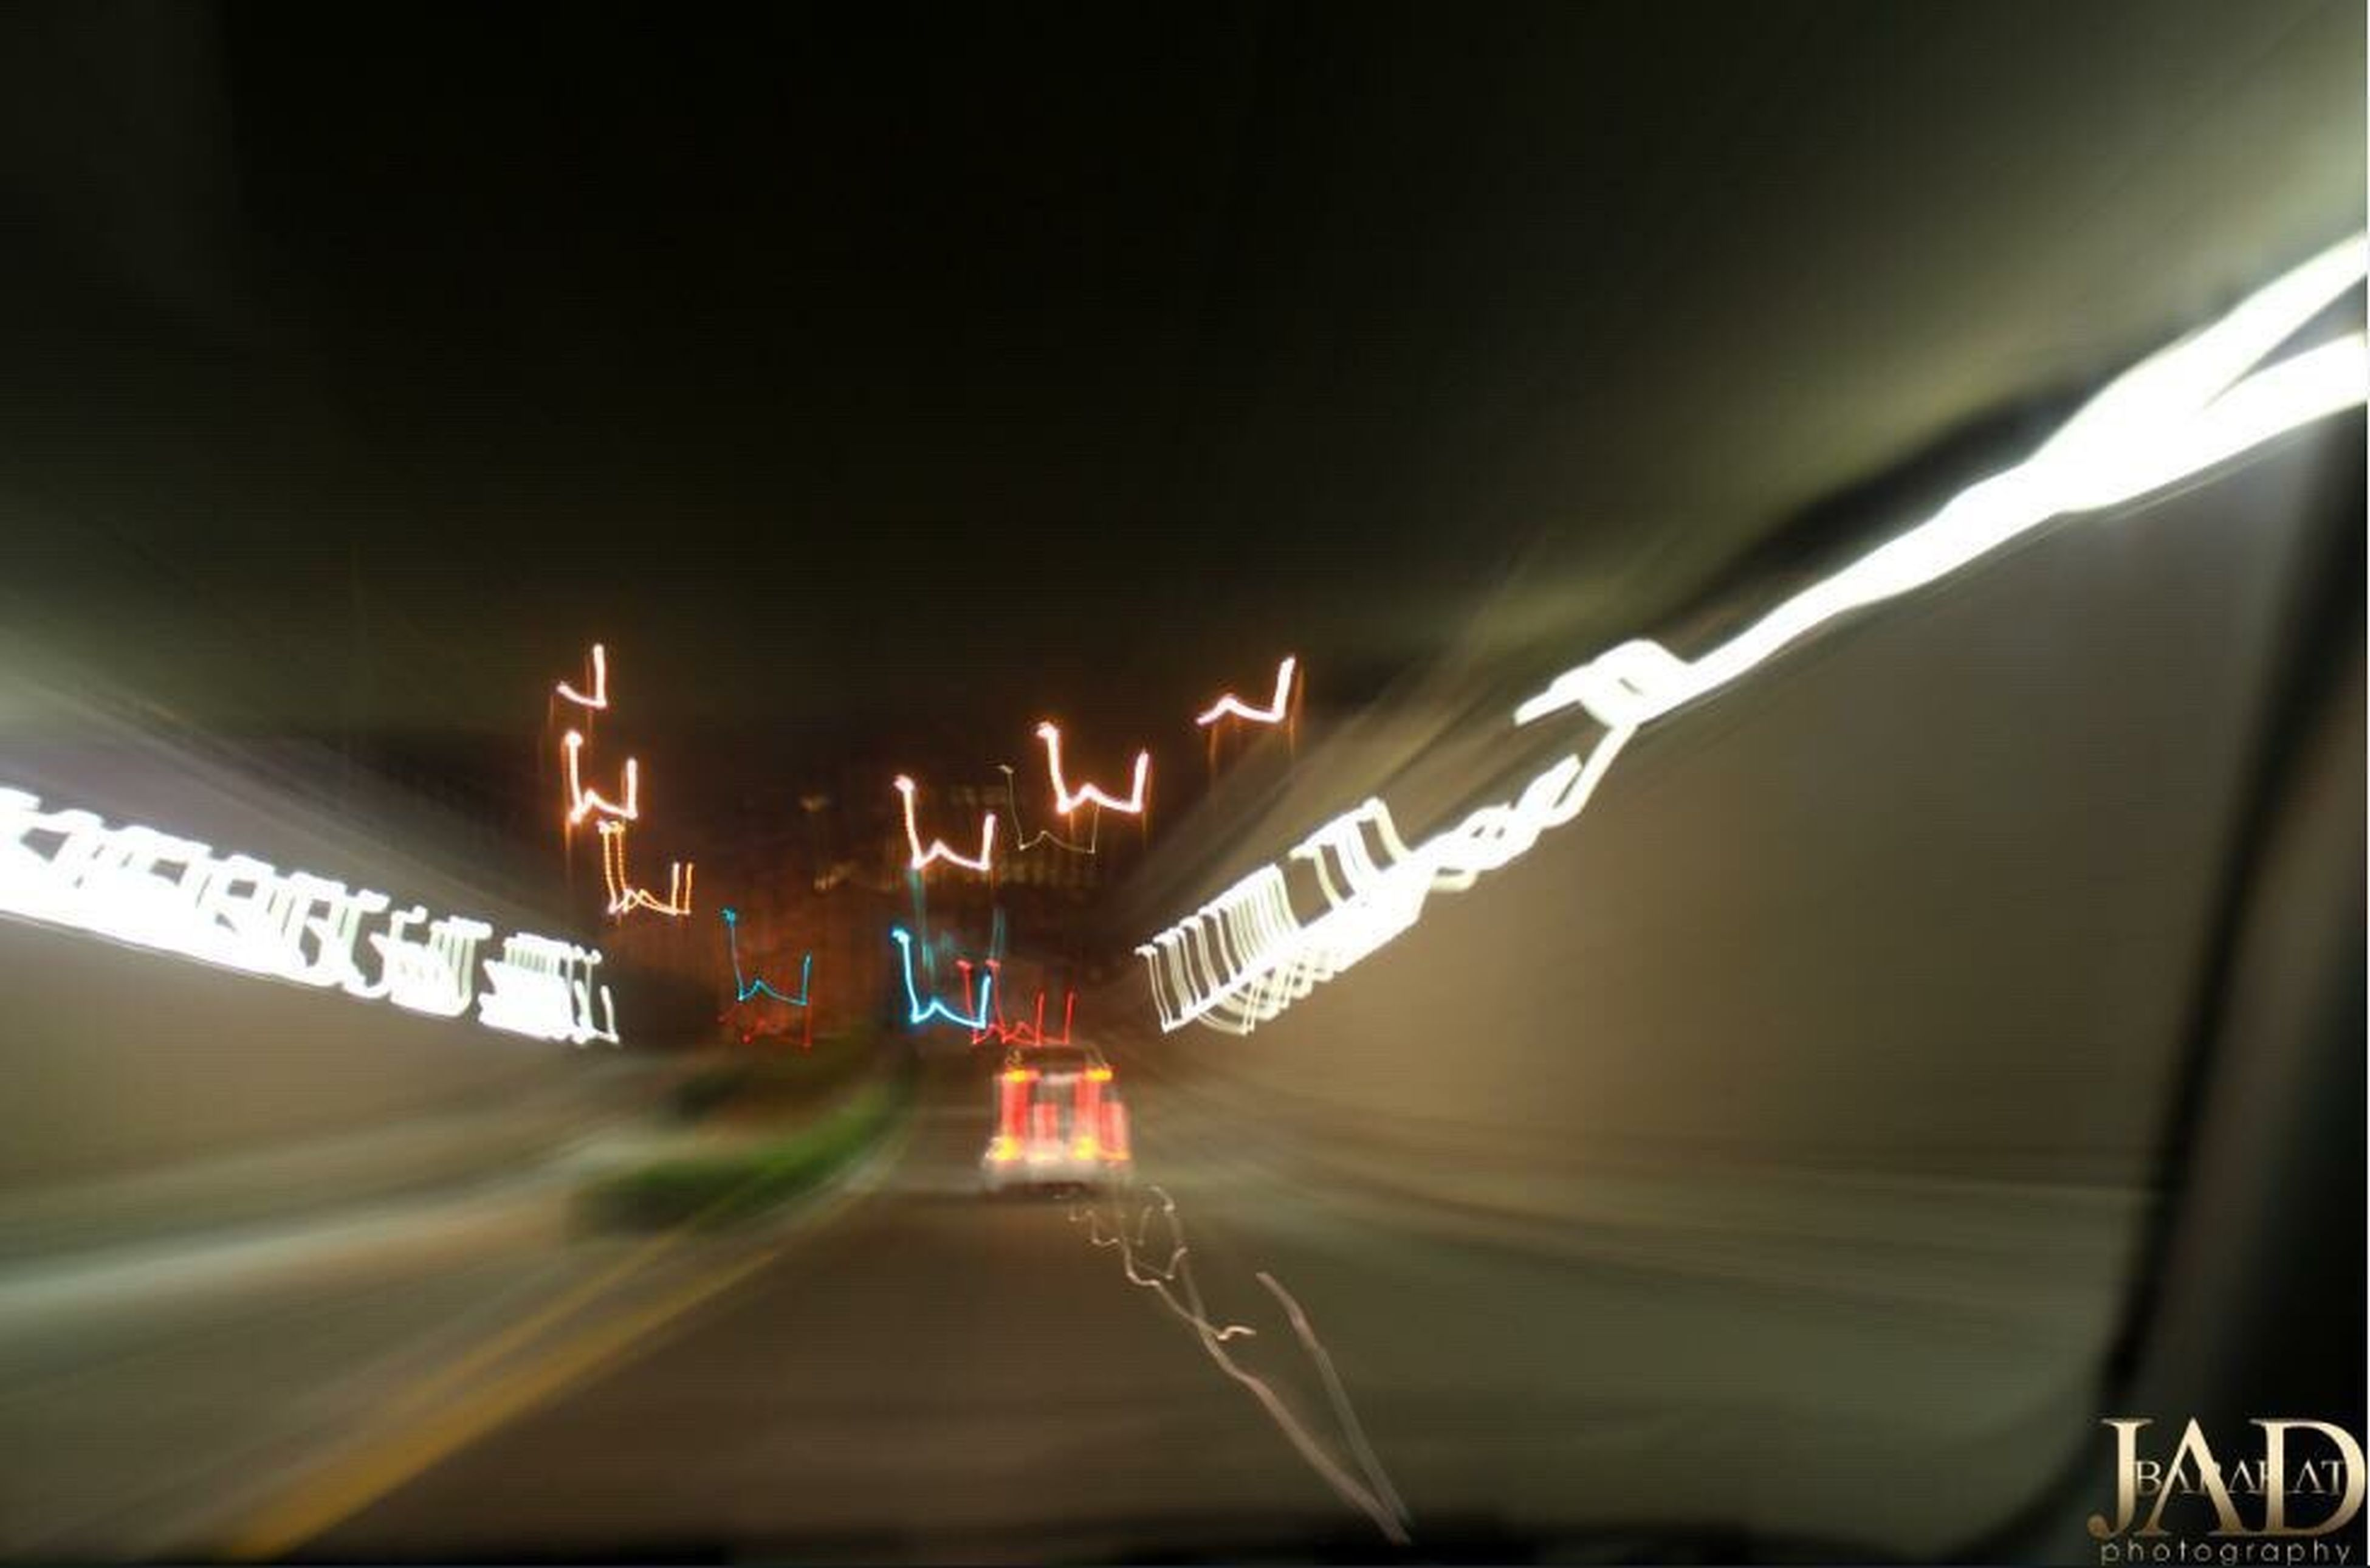 illuminated, transportation, motion, night, tunnel, speed, no people, outdoors, close-up